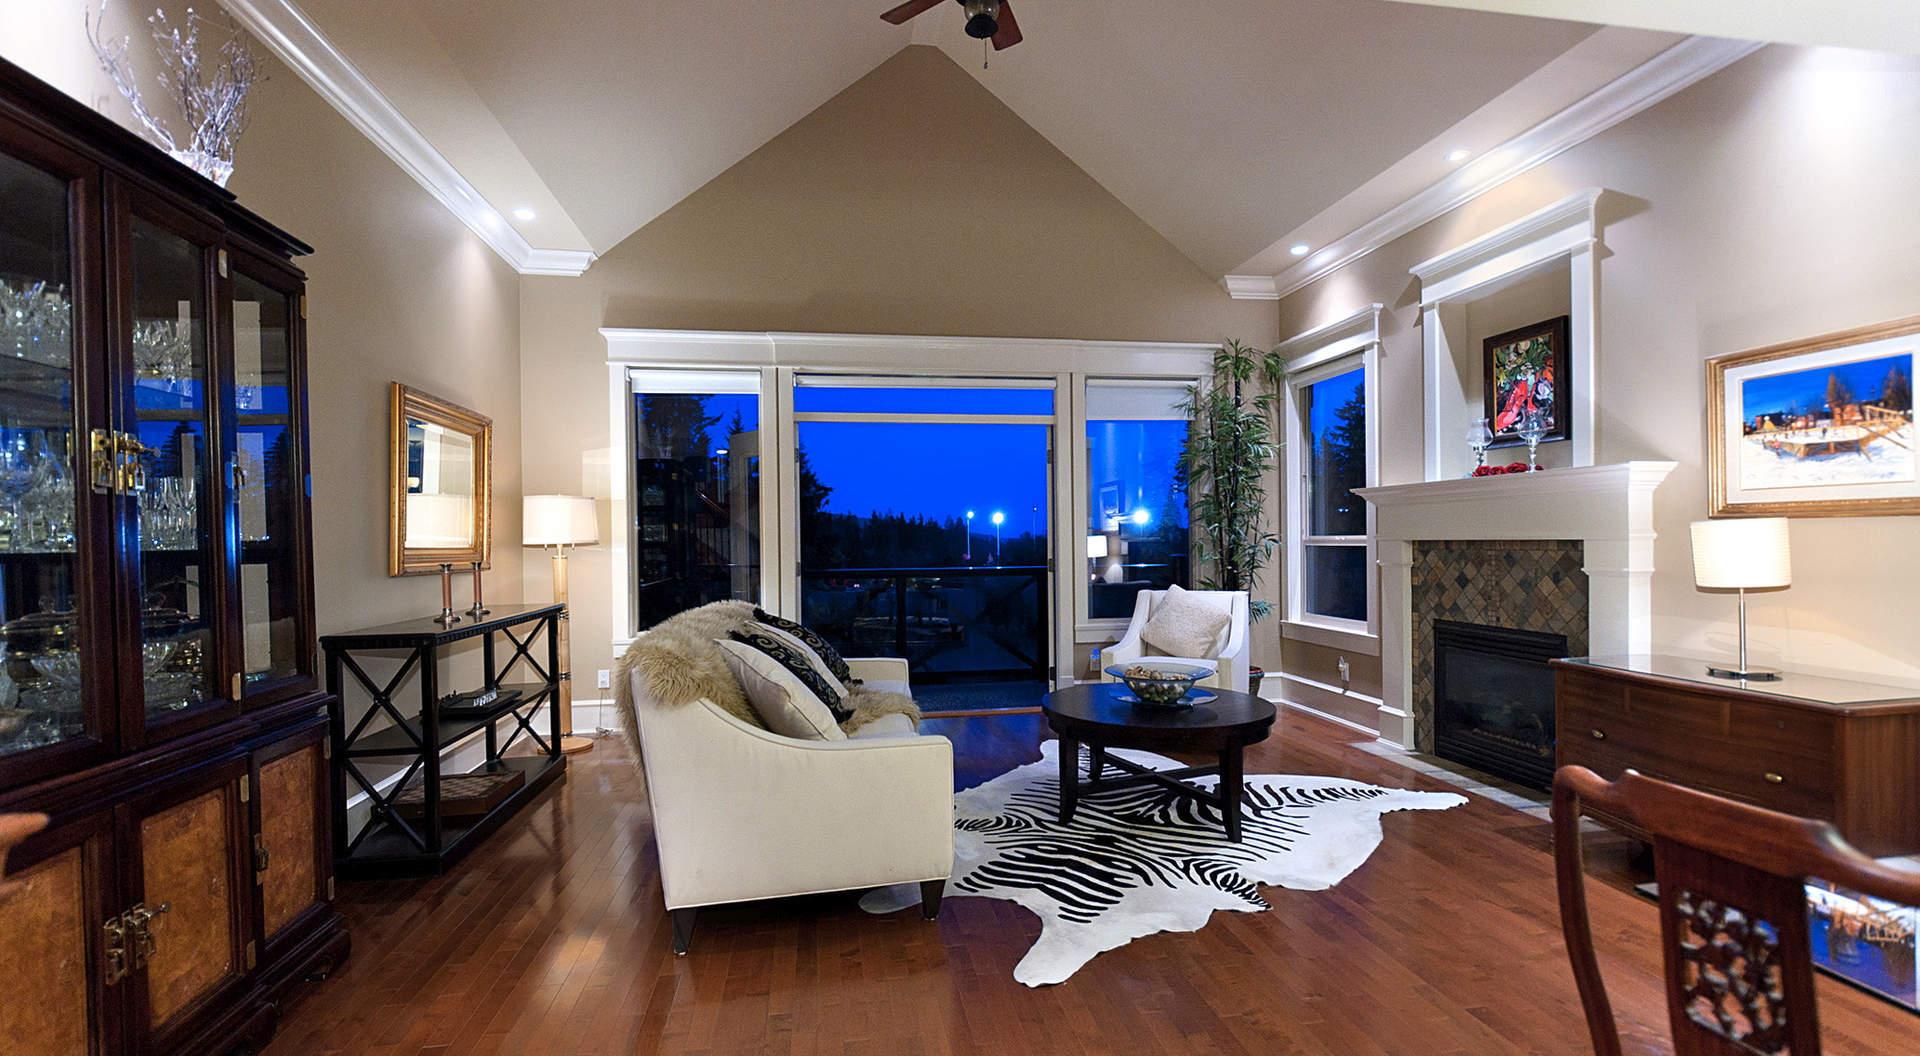 lg kitchen suite orange towels 3454 anne macdonald way - 西温哥华住房与地产——加拿大不列颠哥伦比亚省